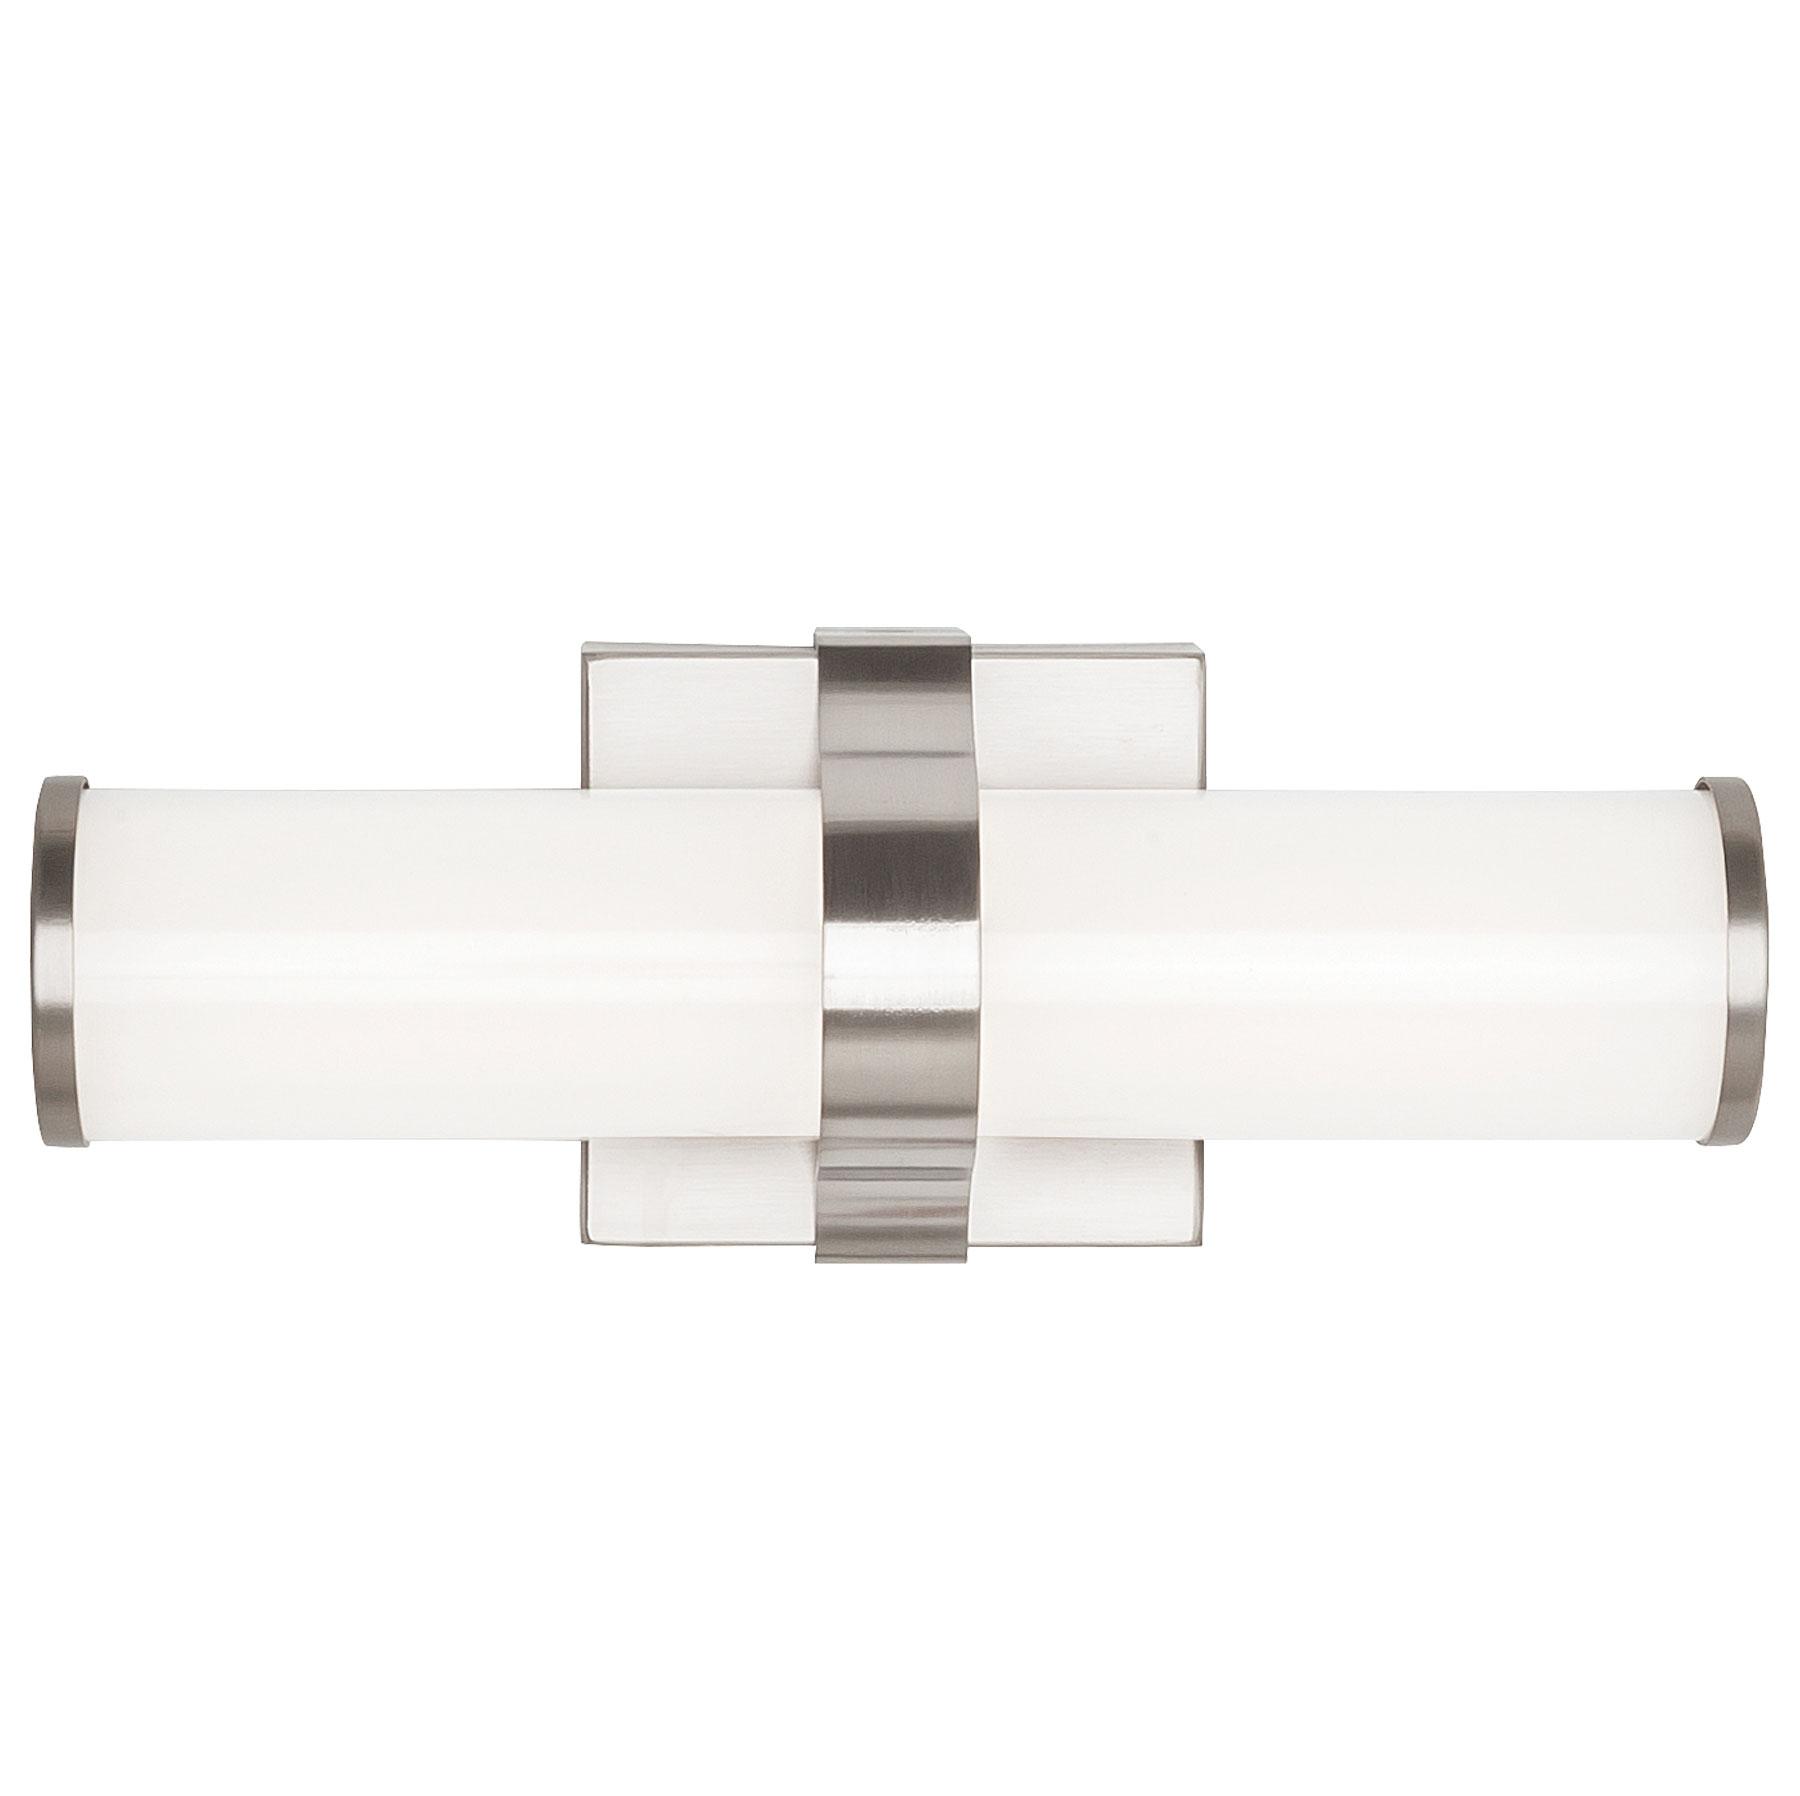 Led bathroom vanity wall lights - Lynk 12 Bathroom Vanity Light By Lbl Lighting Ws916oyscled930